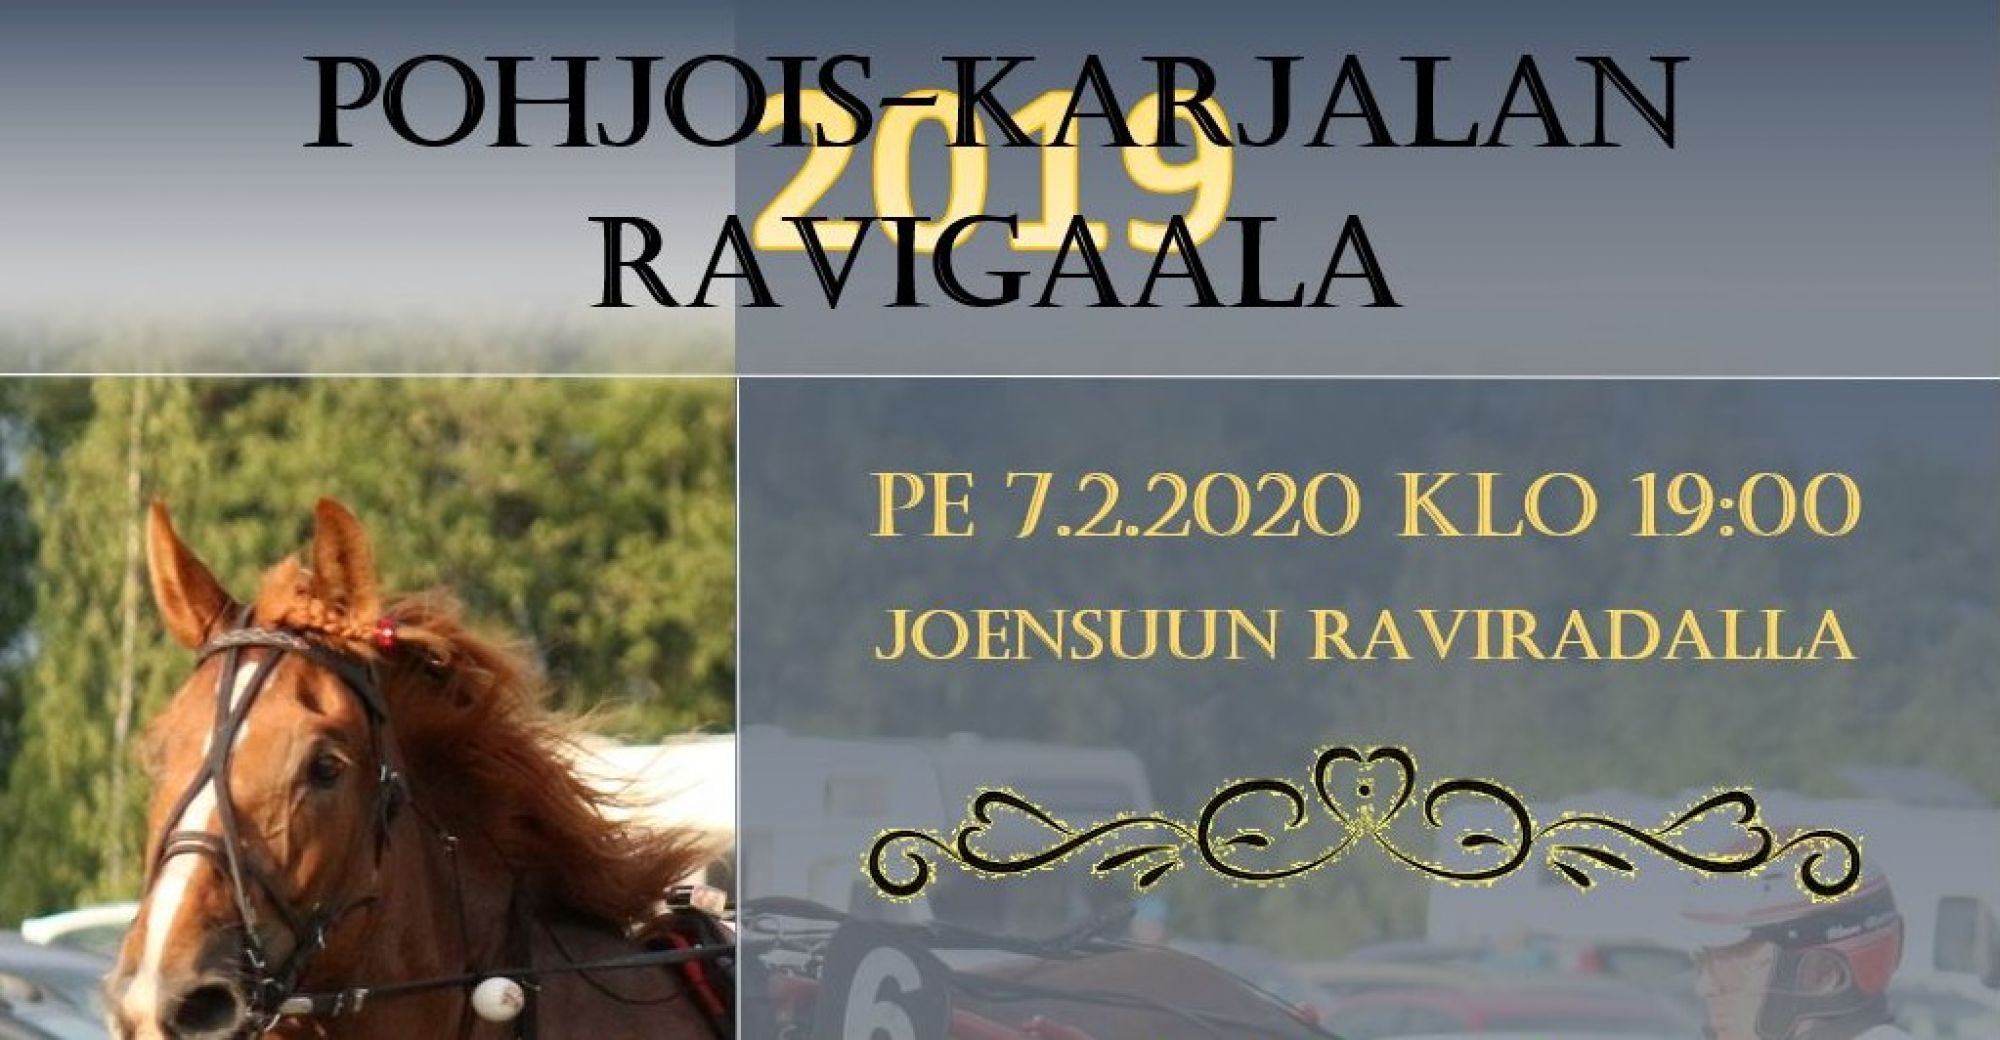 Pohjois-Karjalan Ravigaala 2019